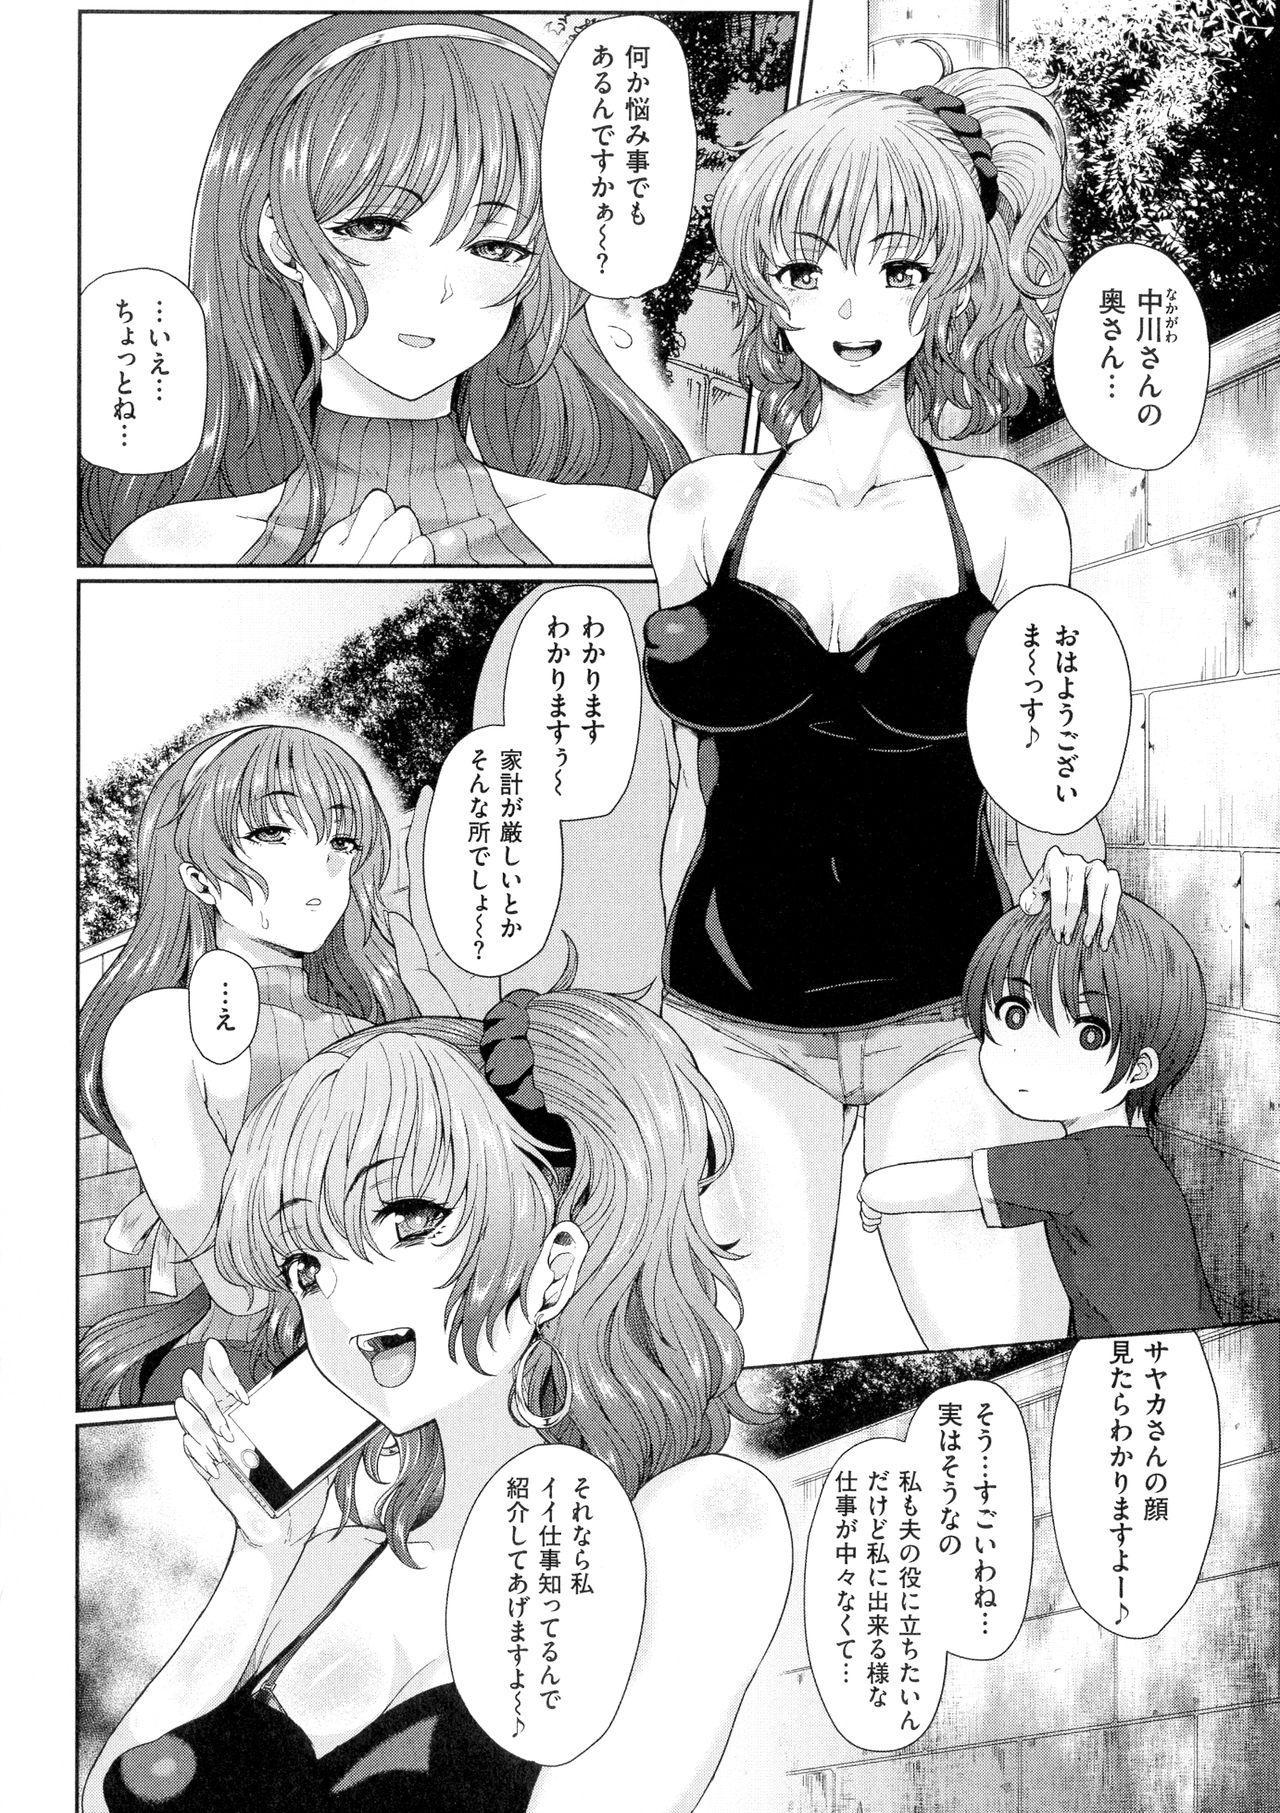 Juku Mesu - Erotic Mature Women 126